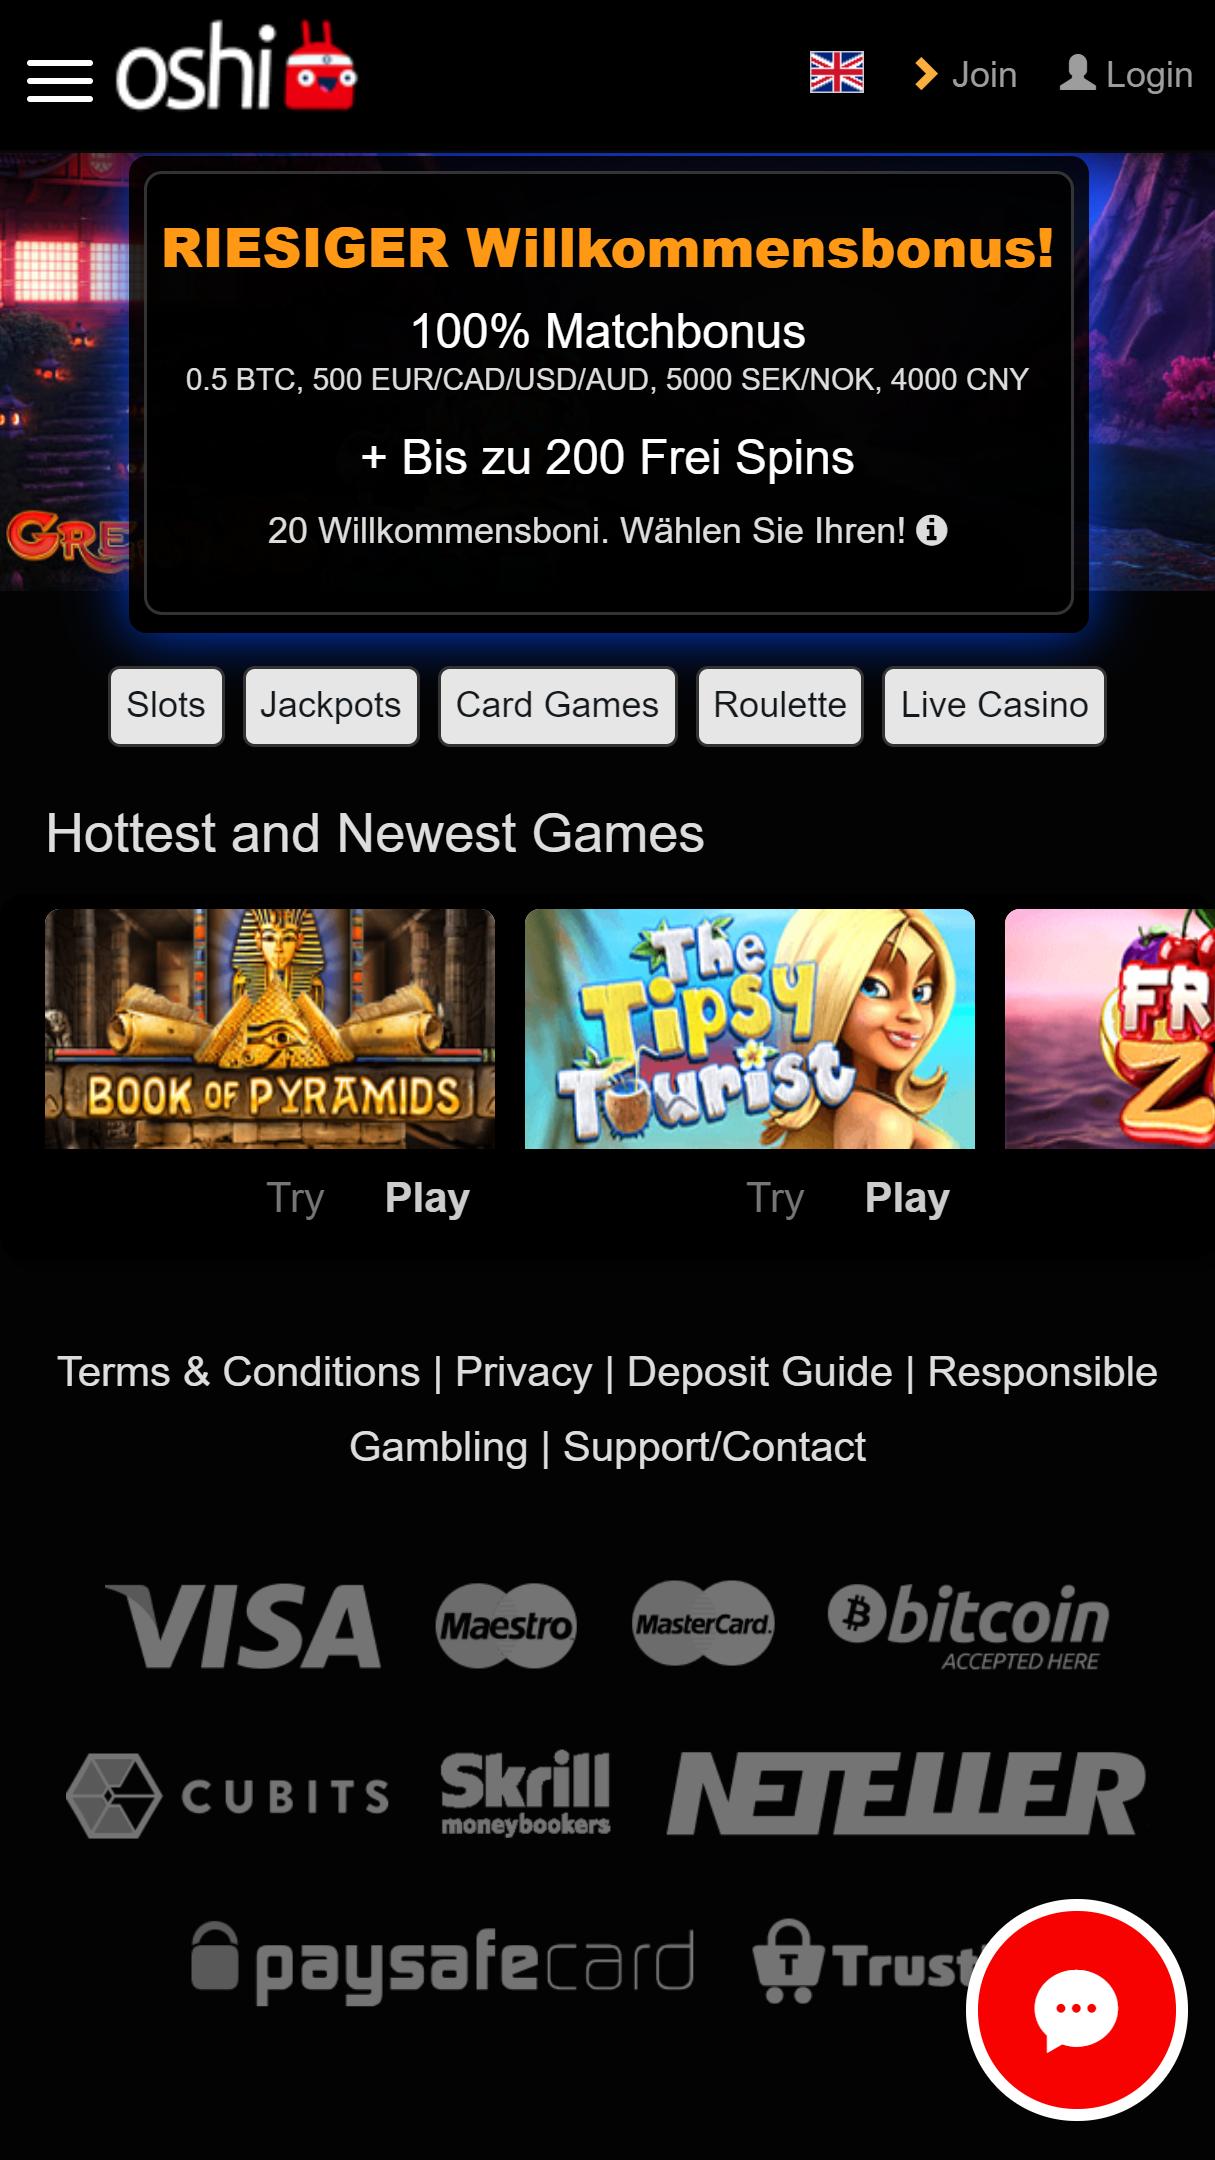 Oshi Casino App Homepage